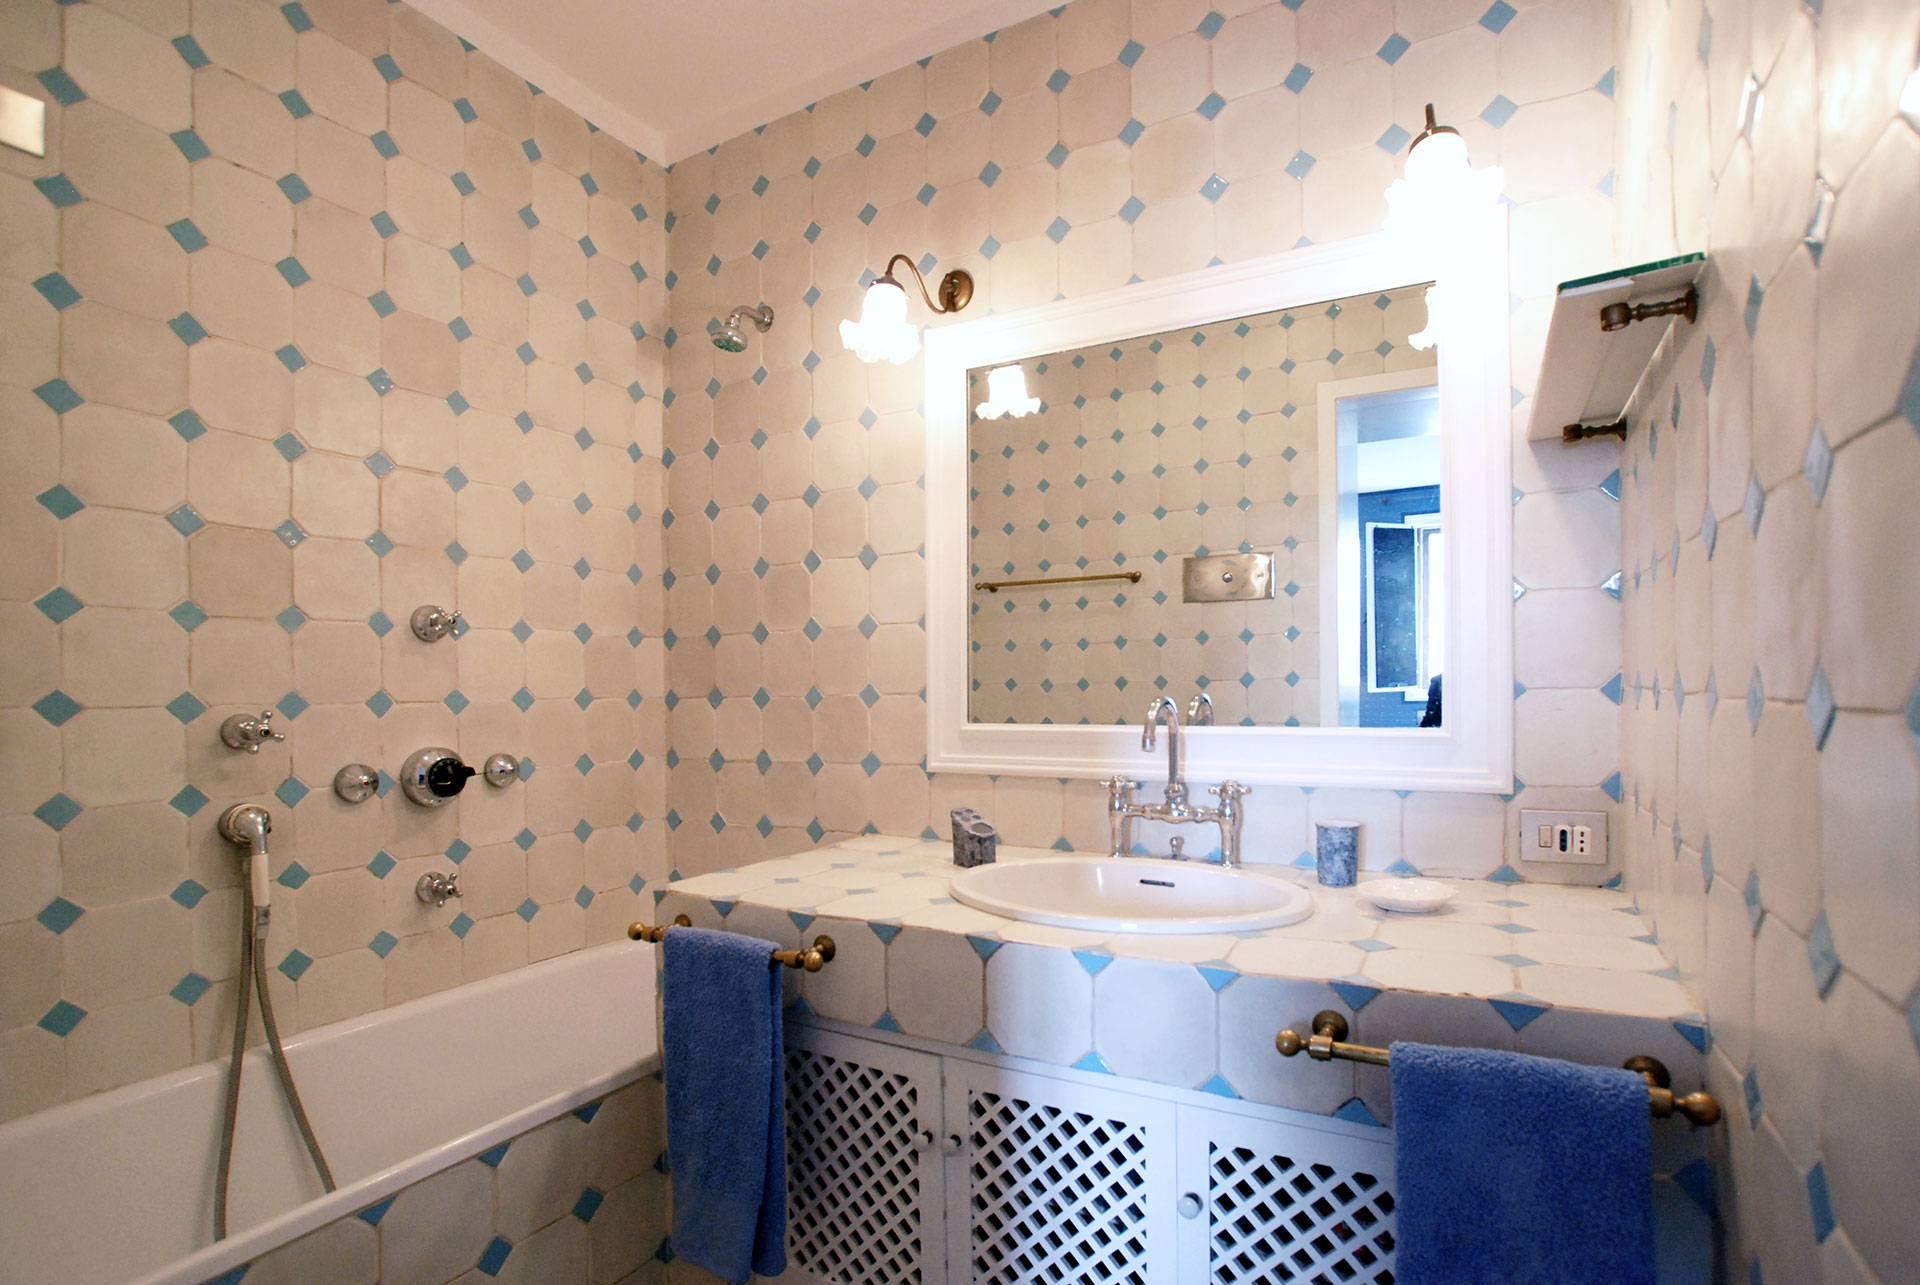 classic style en-suite bathroom of the master bedroom